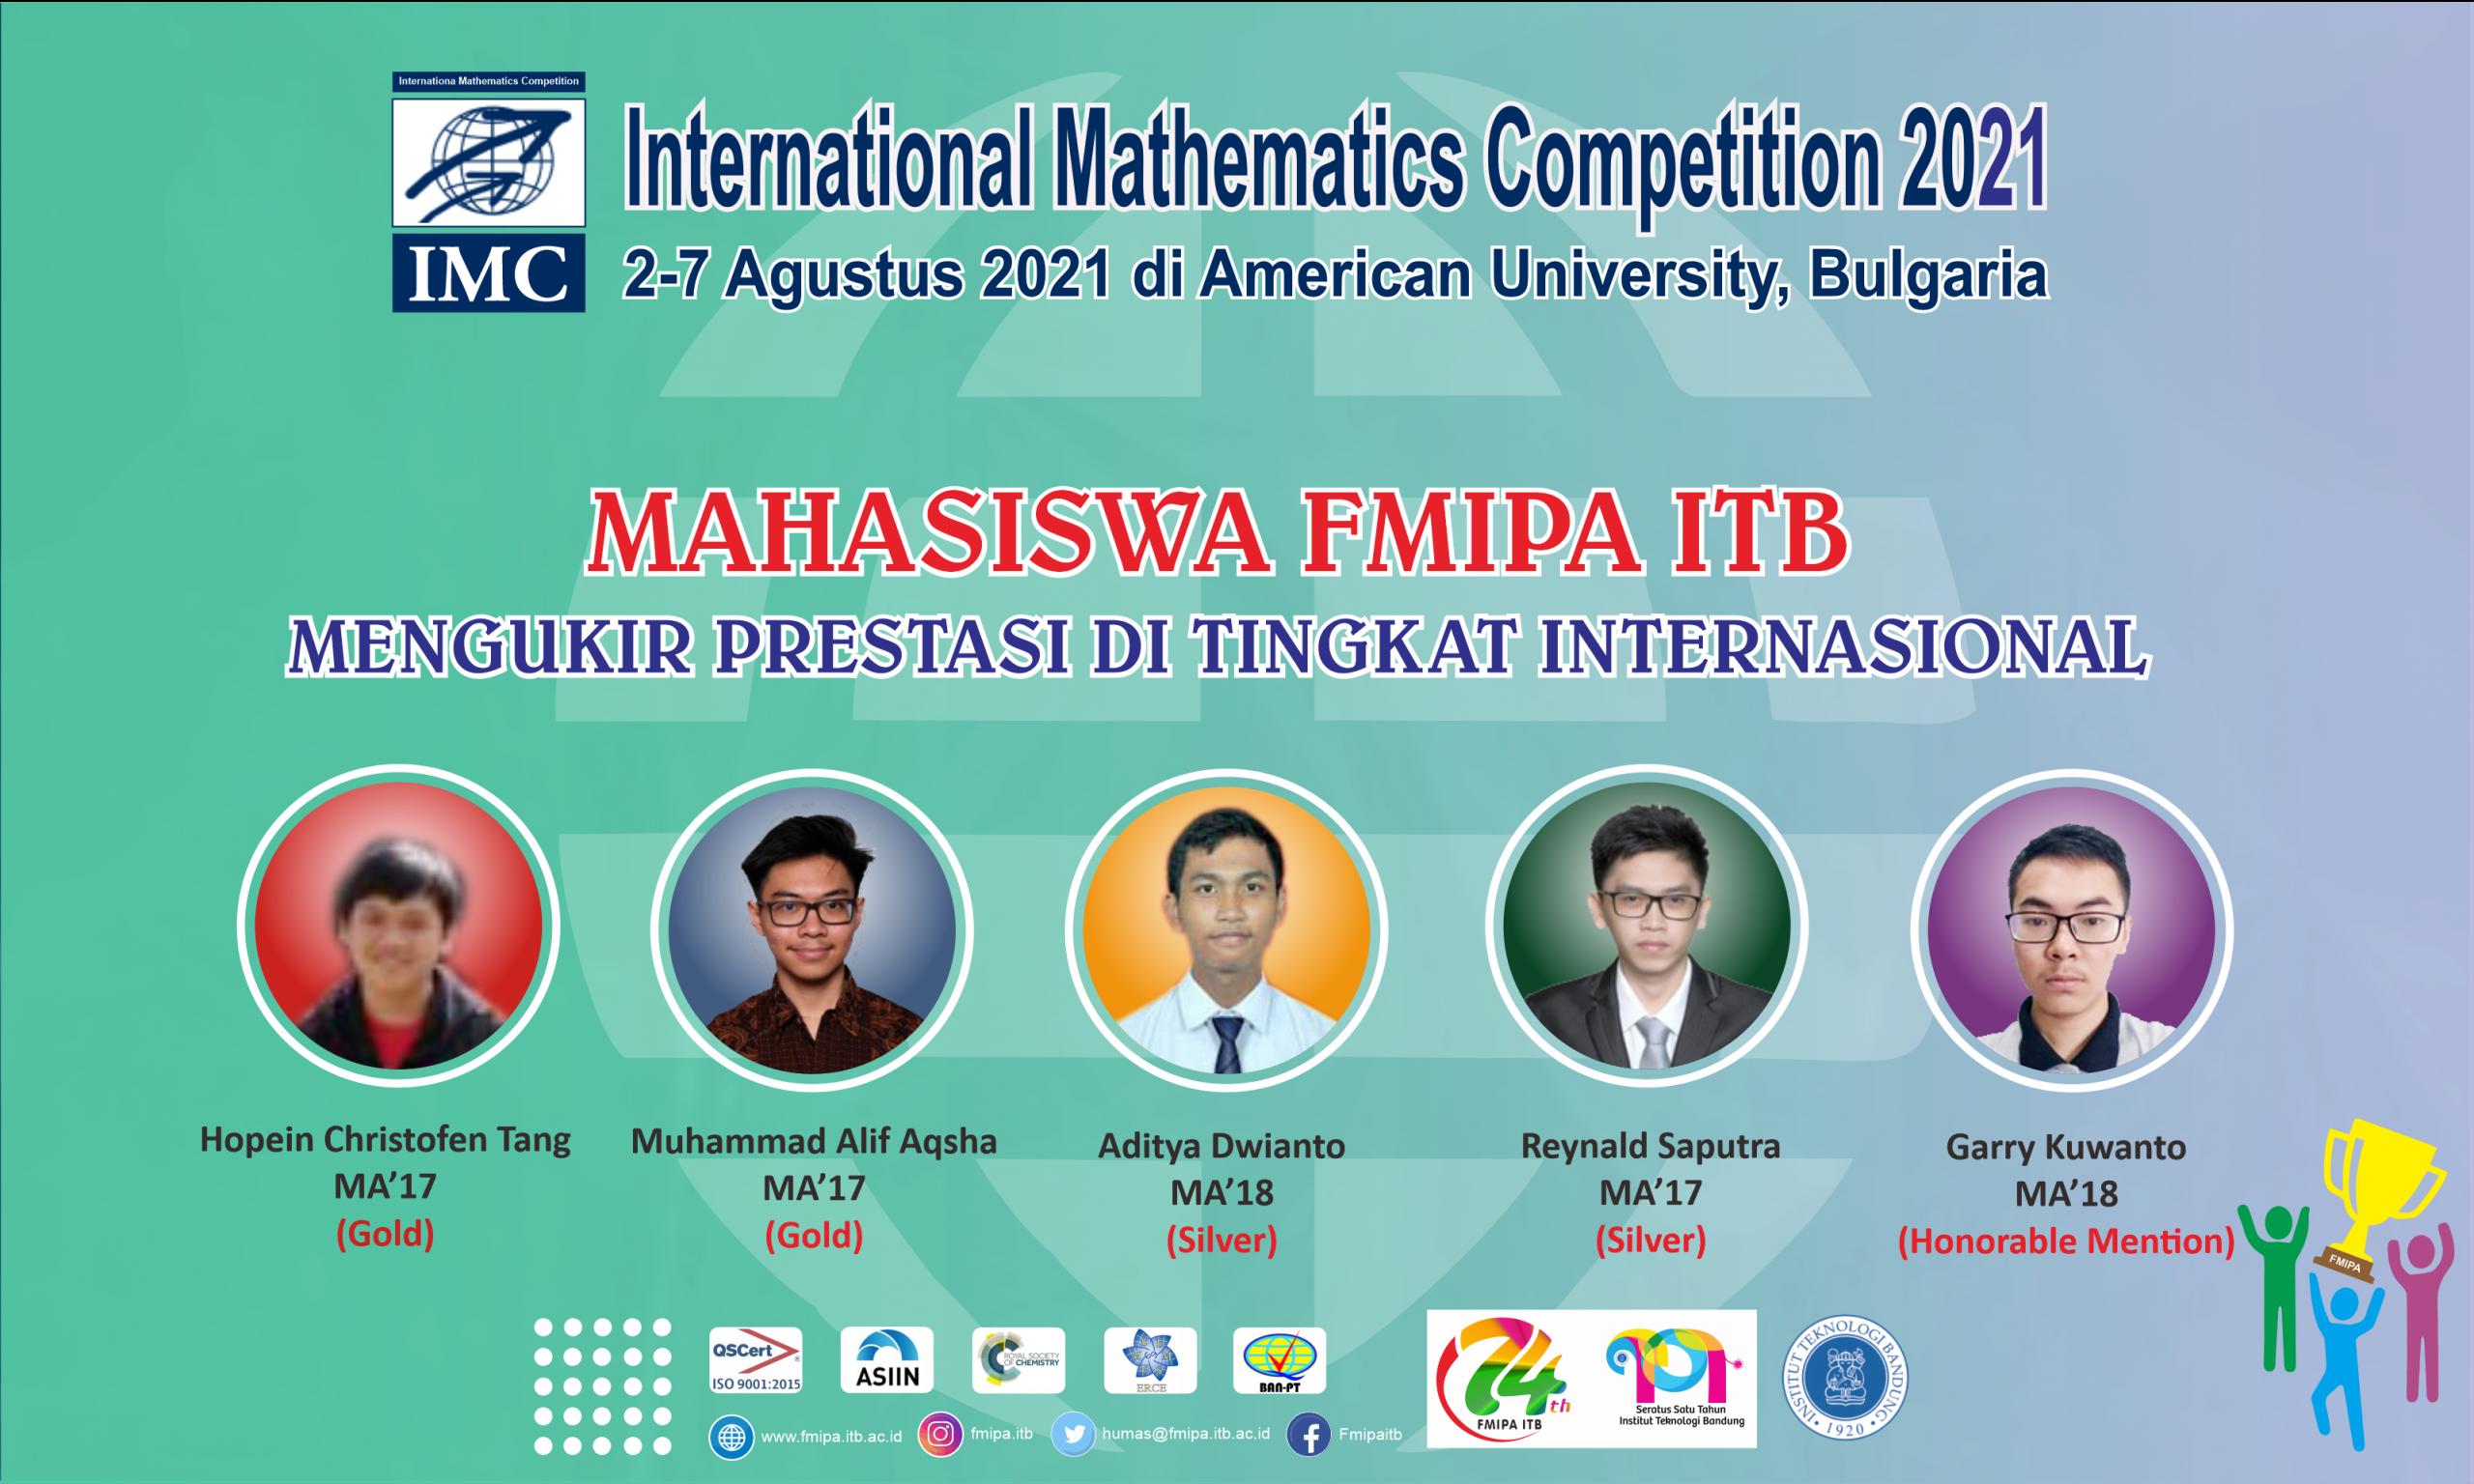 Mahasiswa Program Studi Sarjana Matematika, FMIPA ITB Meraih Prestasi Internasional dalam ajang International Mathematics Competition 2021